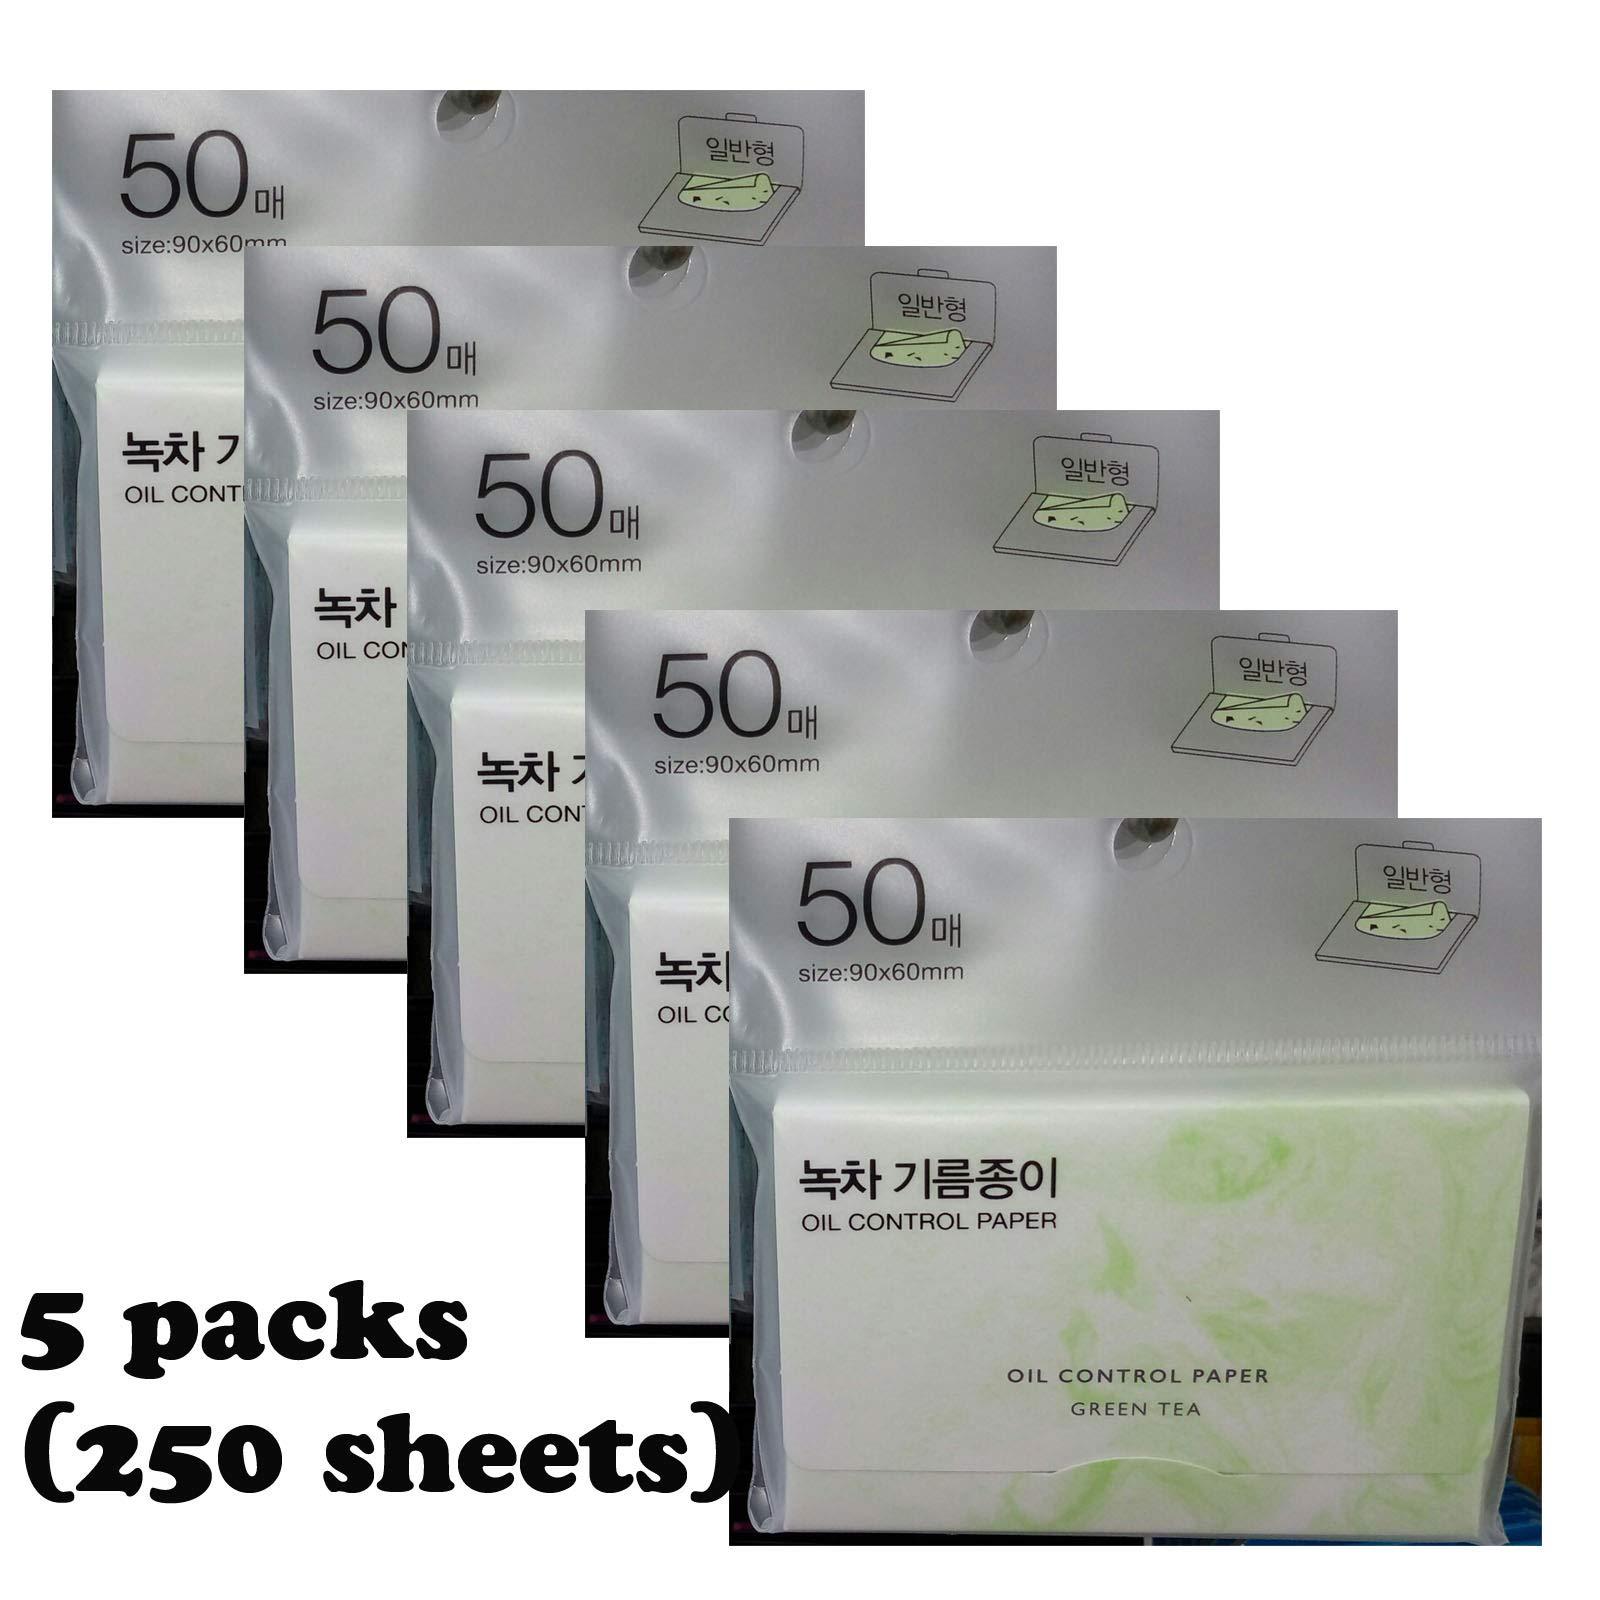 Oil Control Paper Green Tea 250 pcs Absorbing Tissue Face Blotting Made in Korea